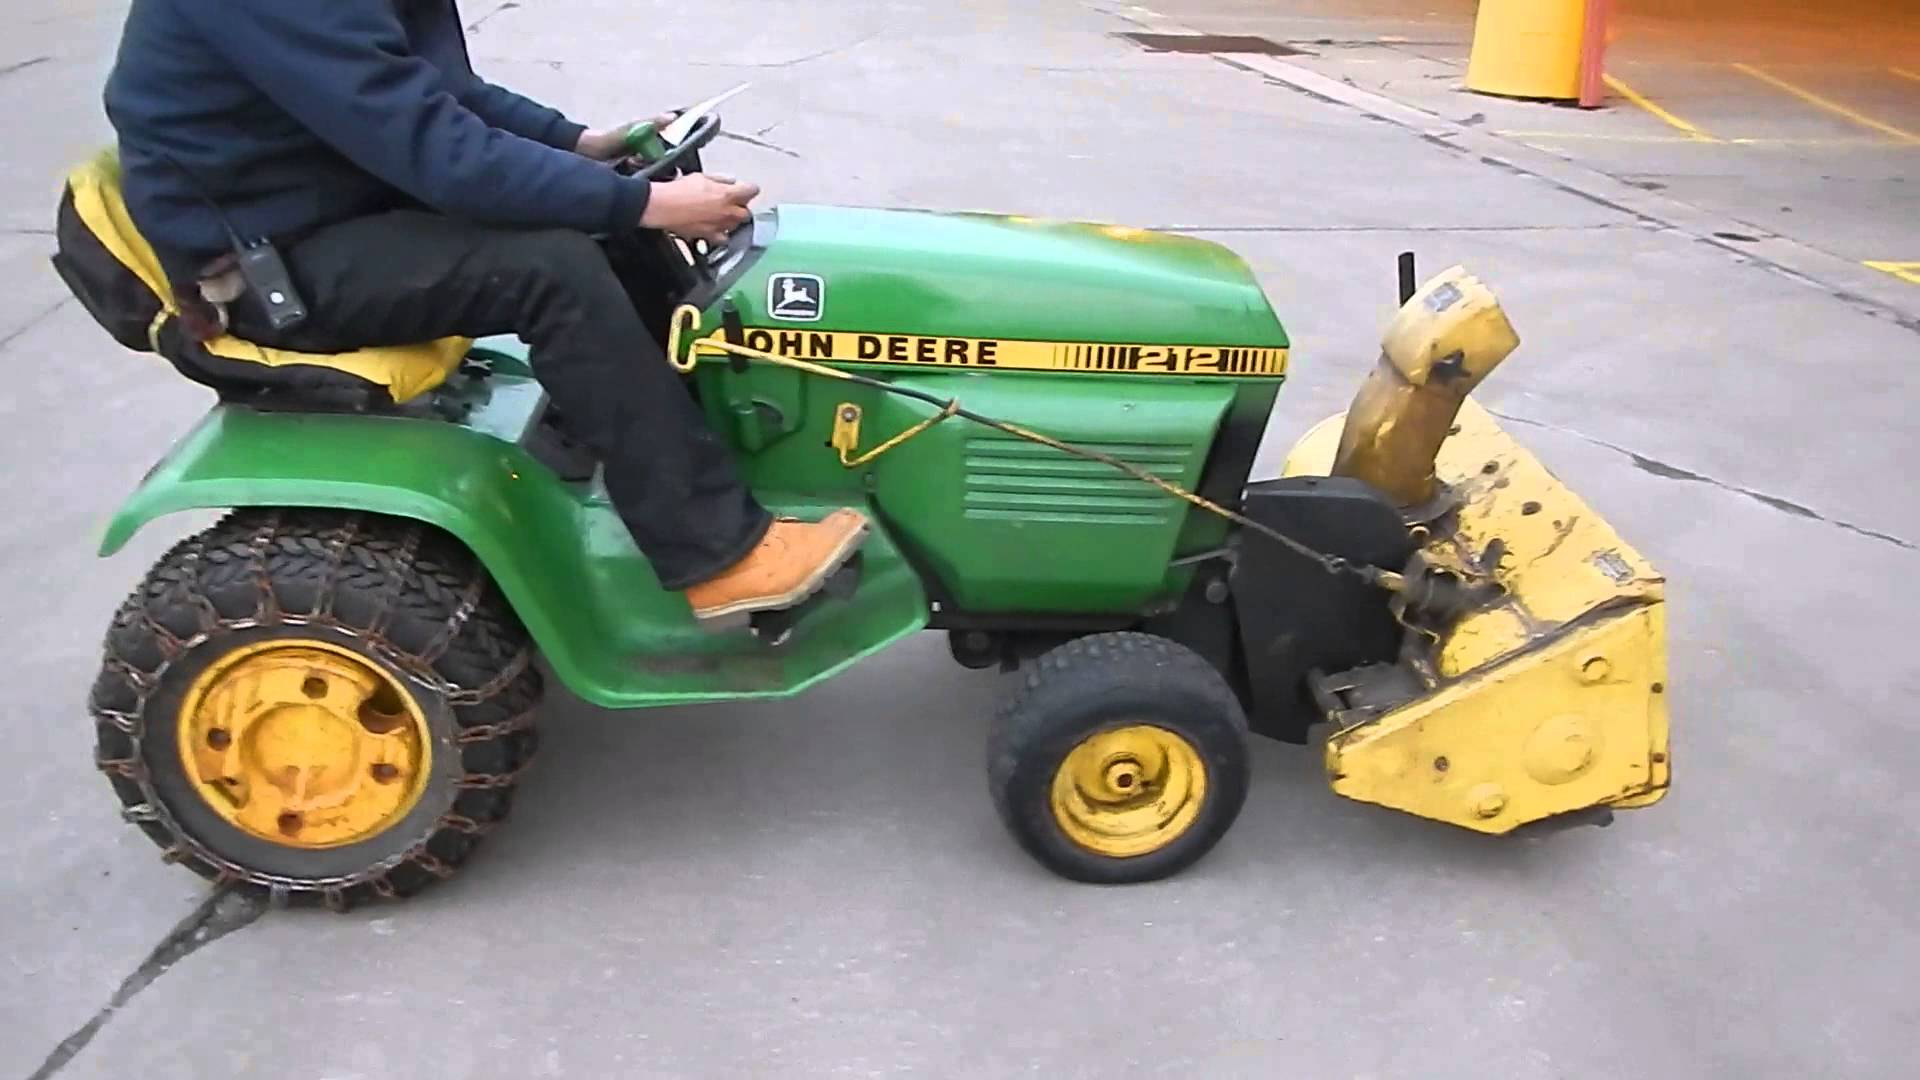 212 John Deere Riding Lawn Mower Includes 38 Snow Blower ...